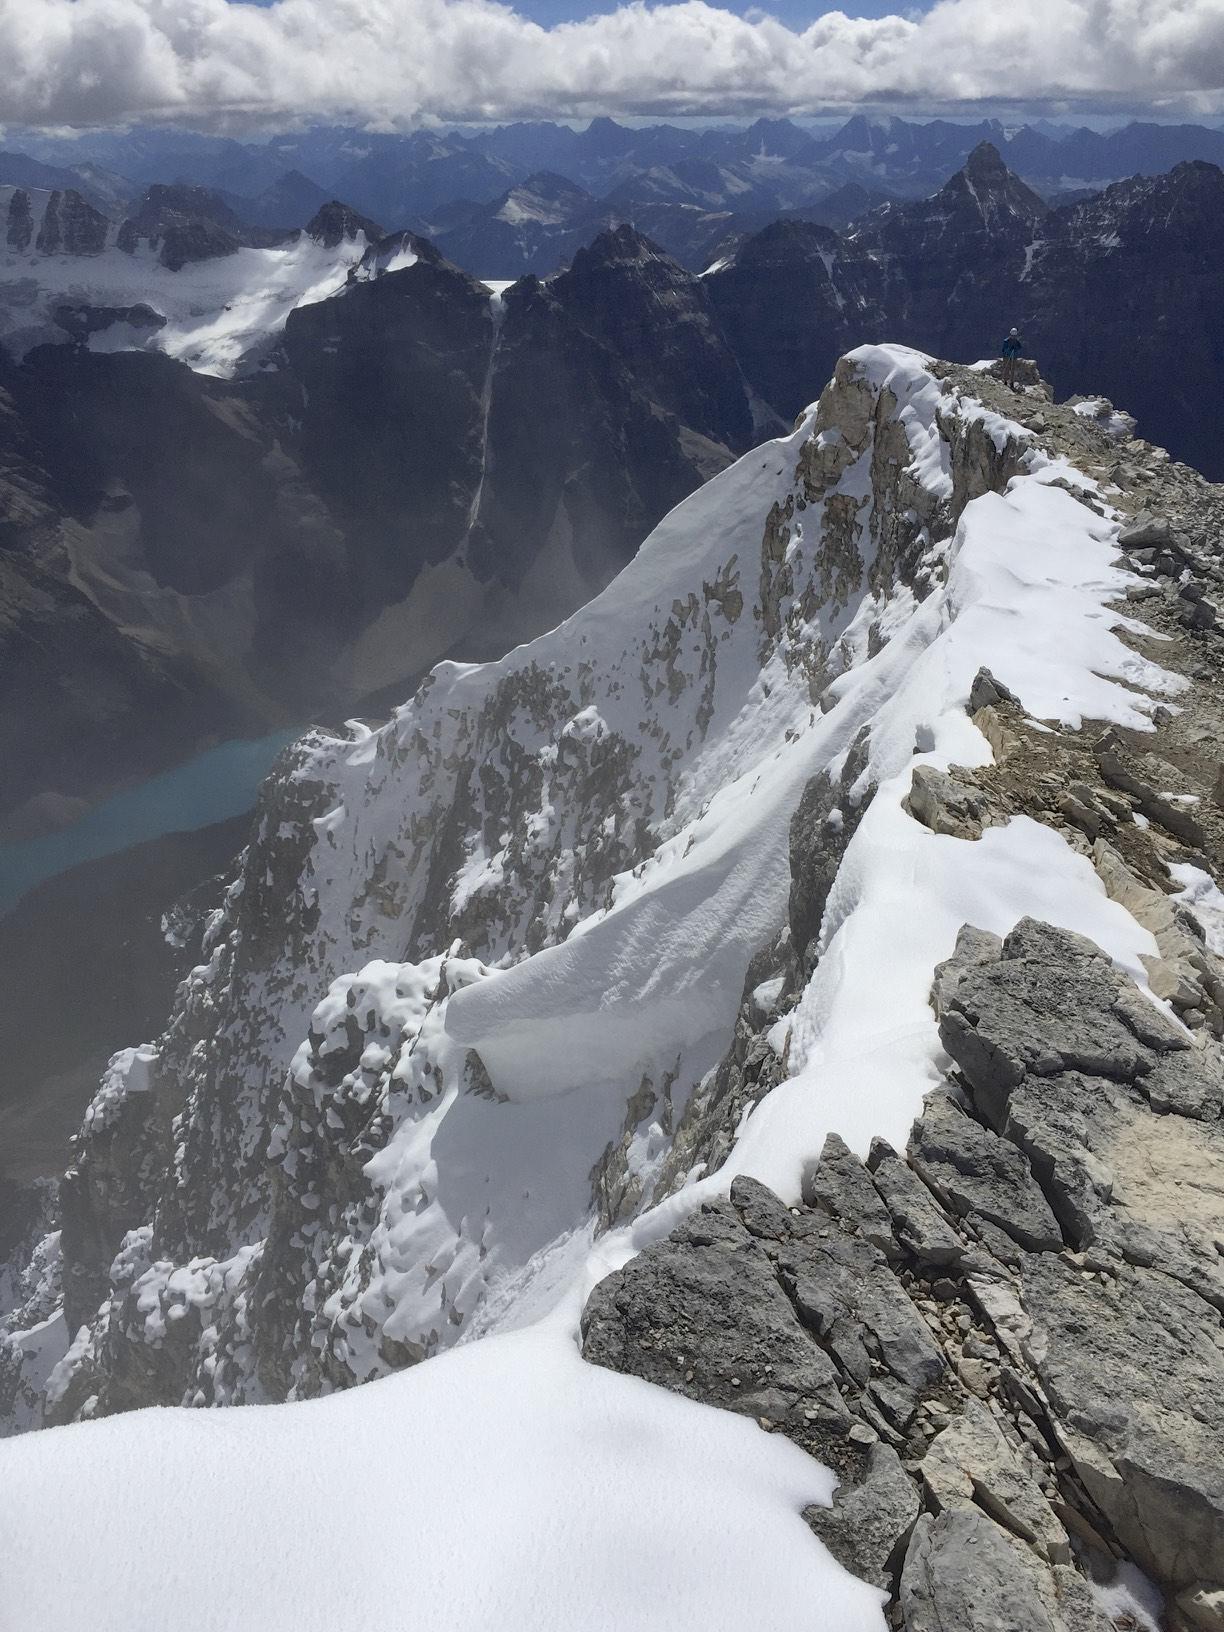 The summit ridge of Mt. Temple